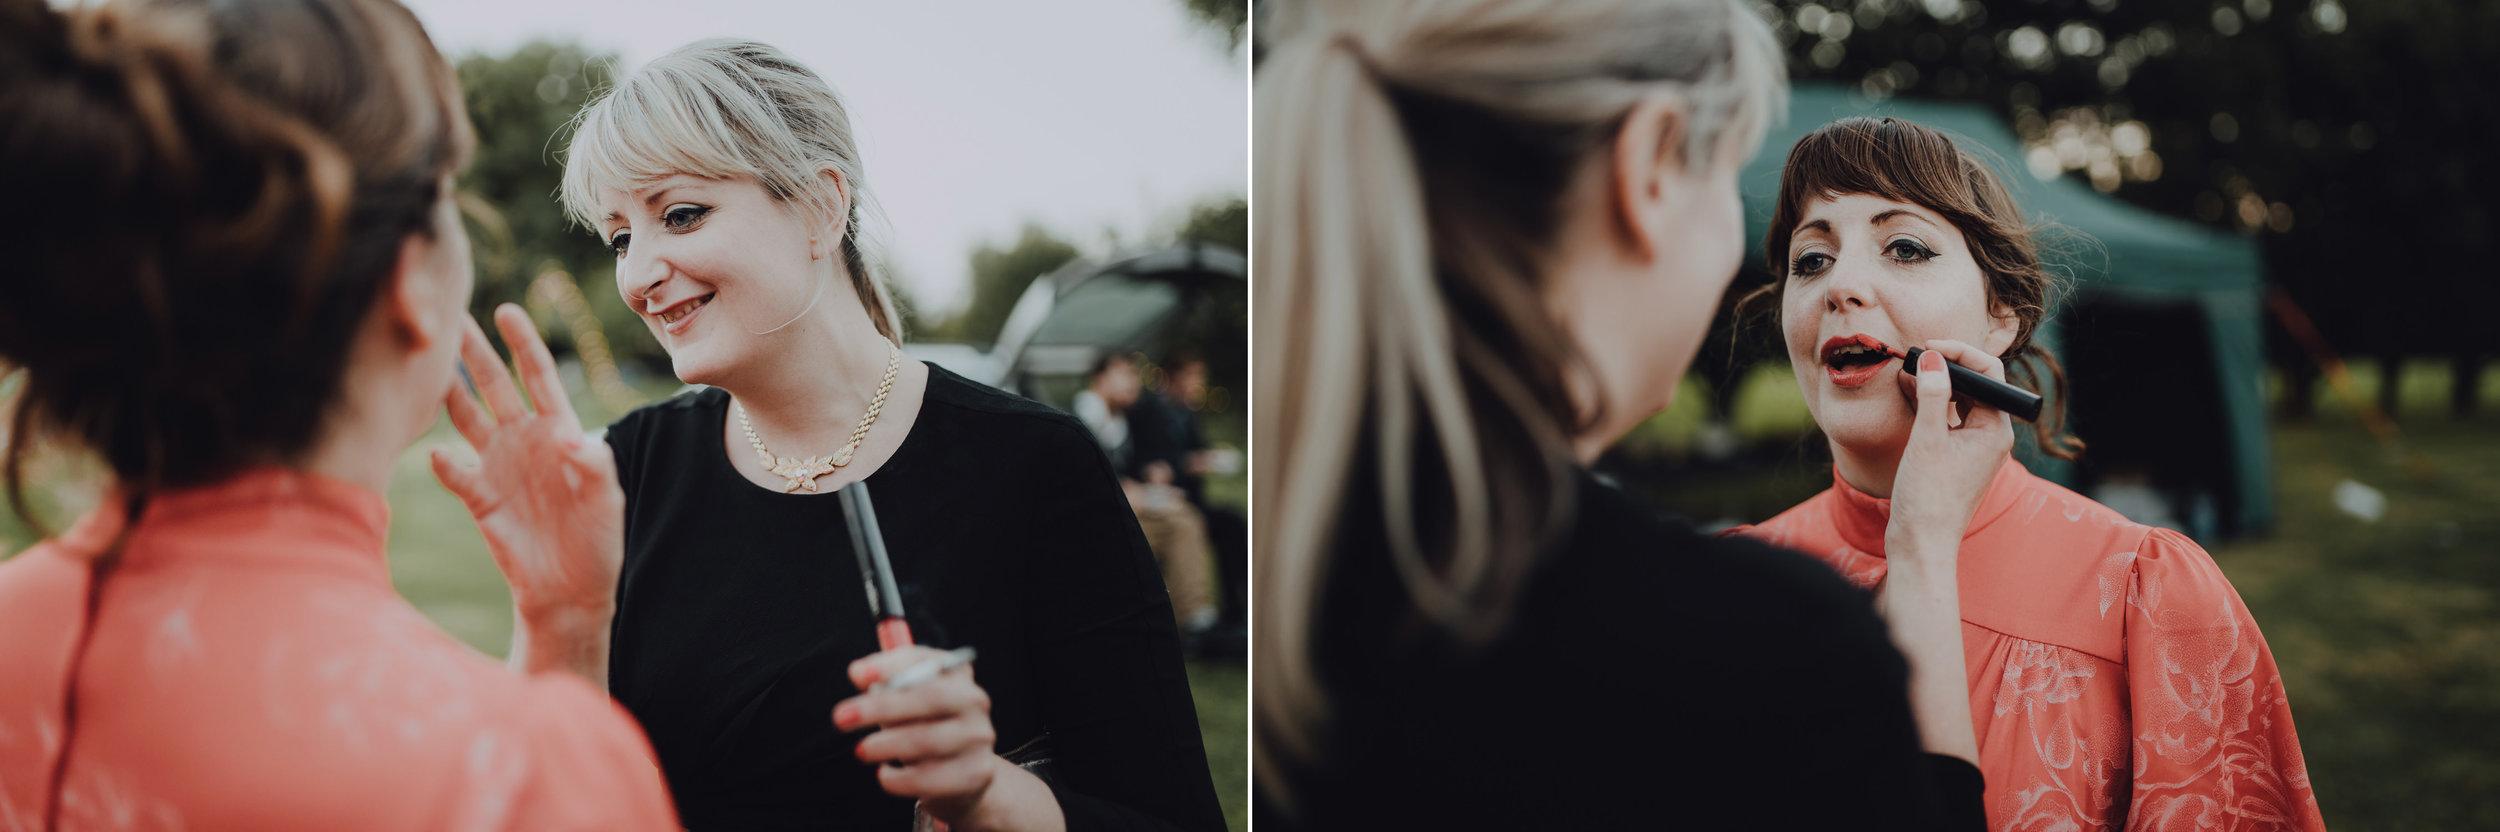 bruidsfotografie-amsterdam-utrecht-mark-hadden-wedding-photography-Cathrin-Michael-418 copy.jpg